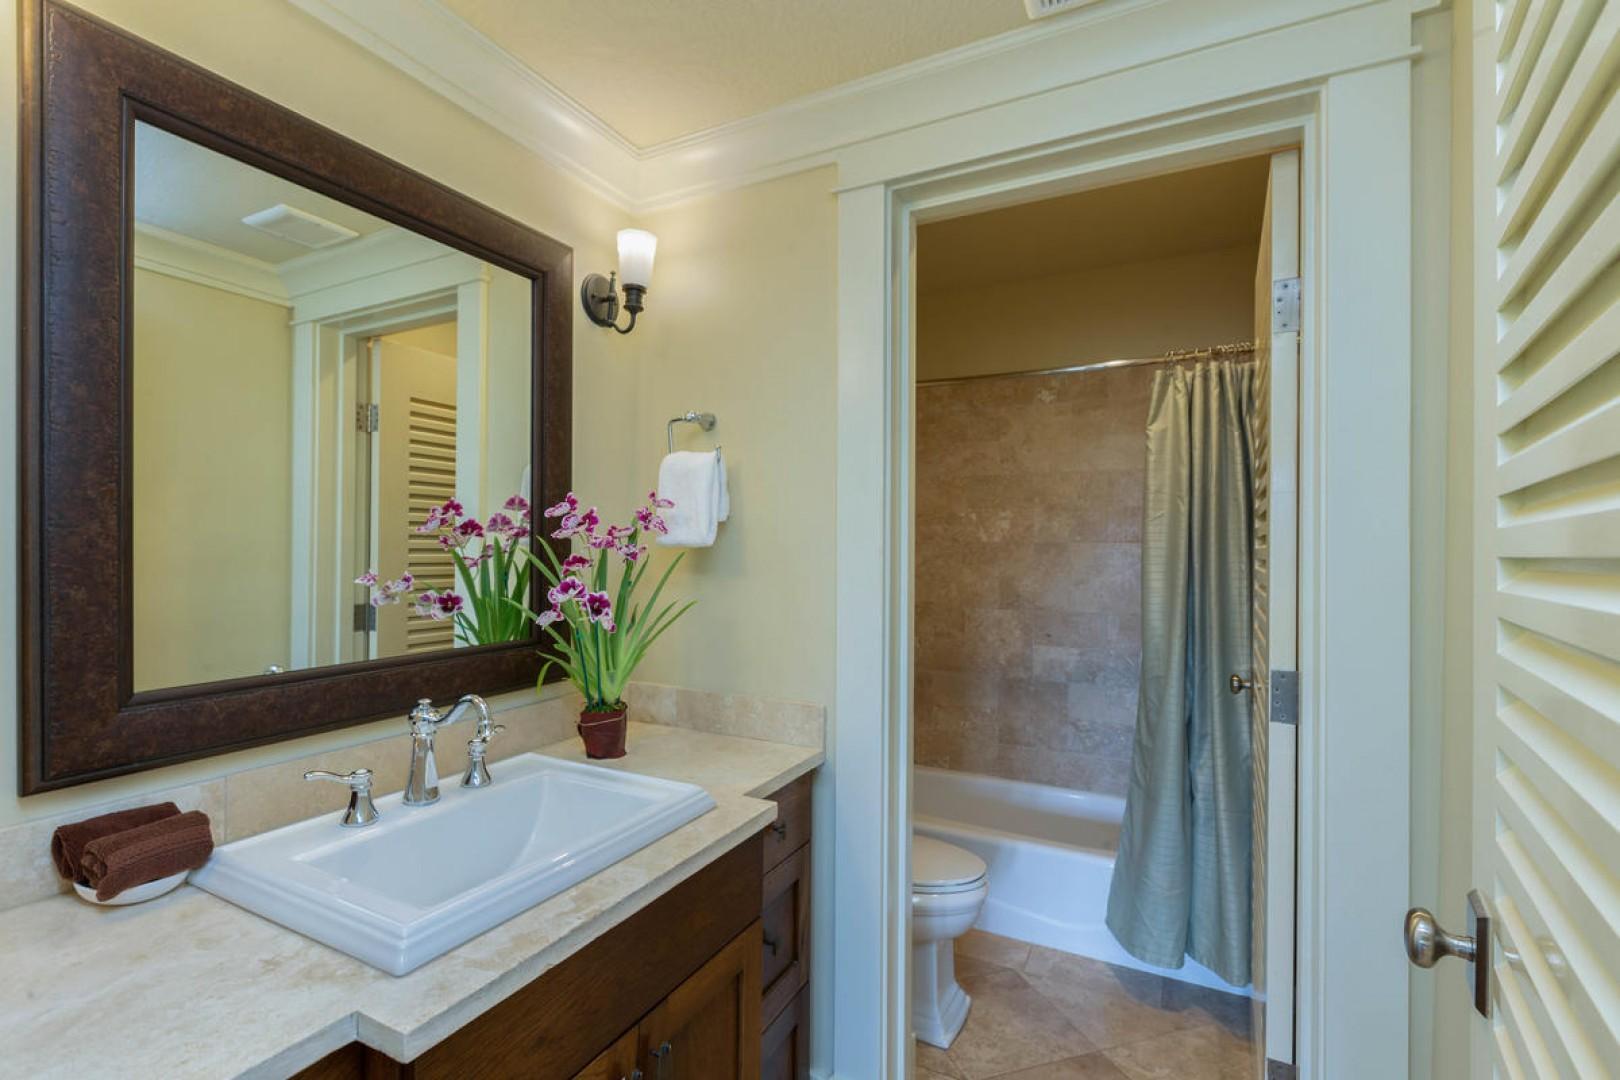 Guest bathroom 3 with tub